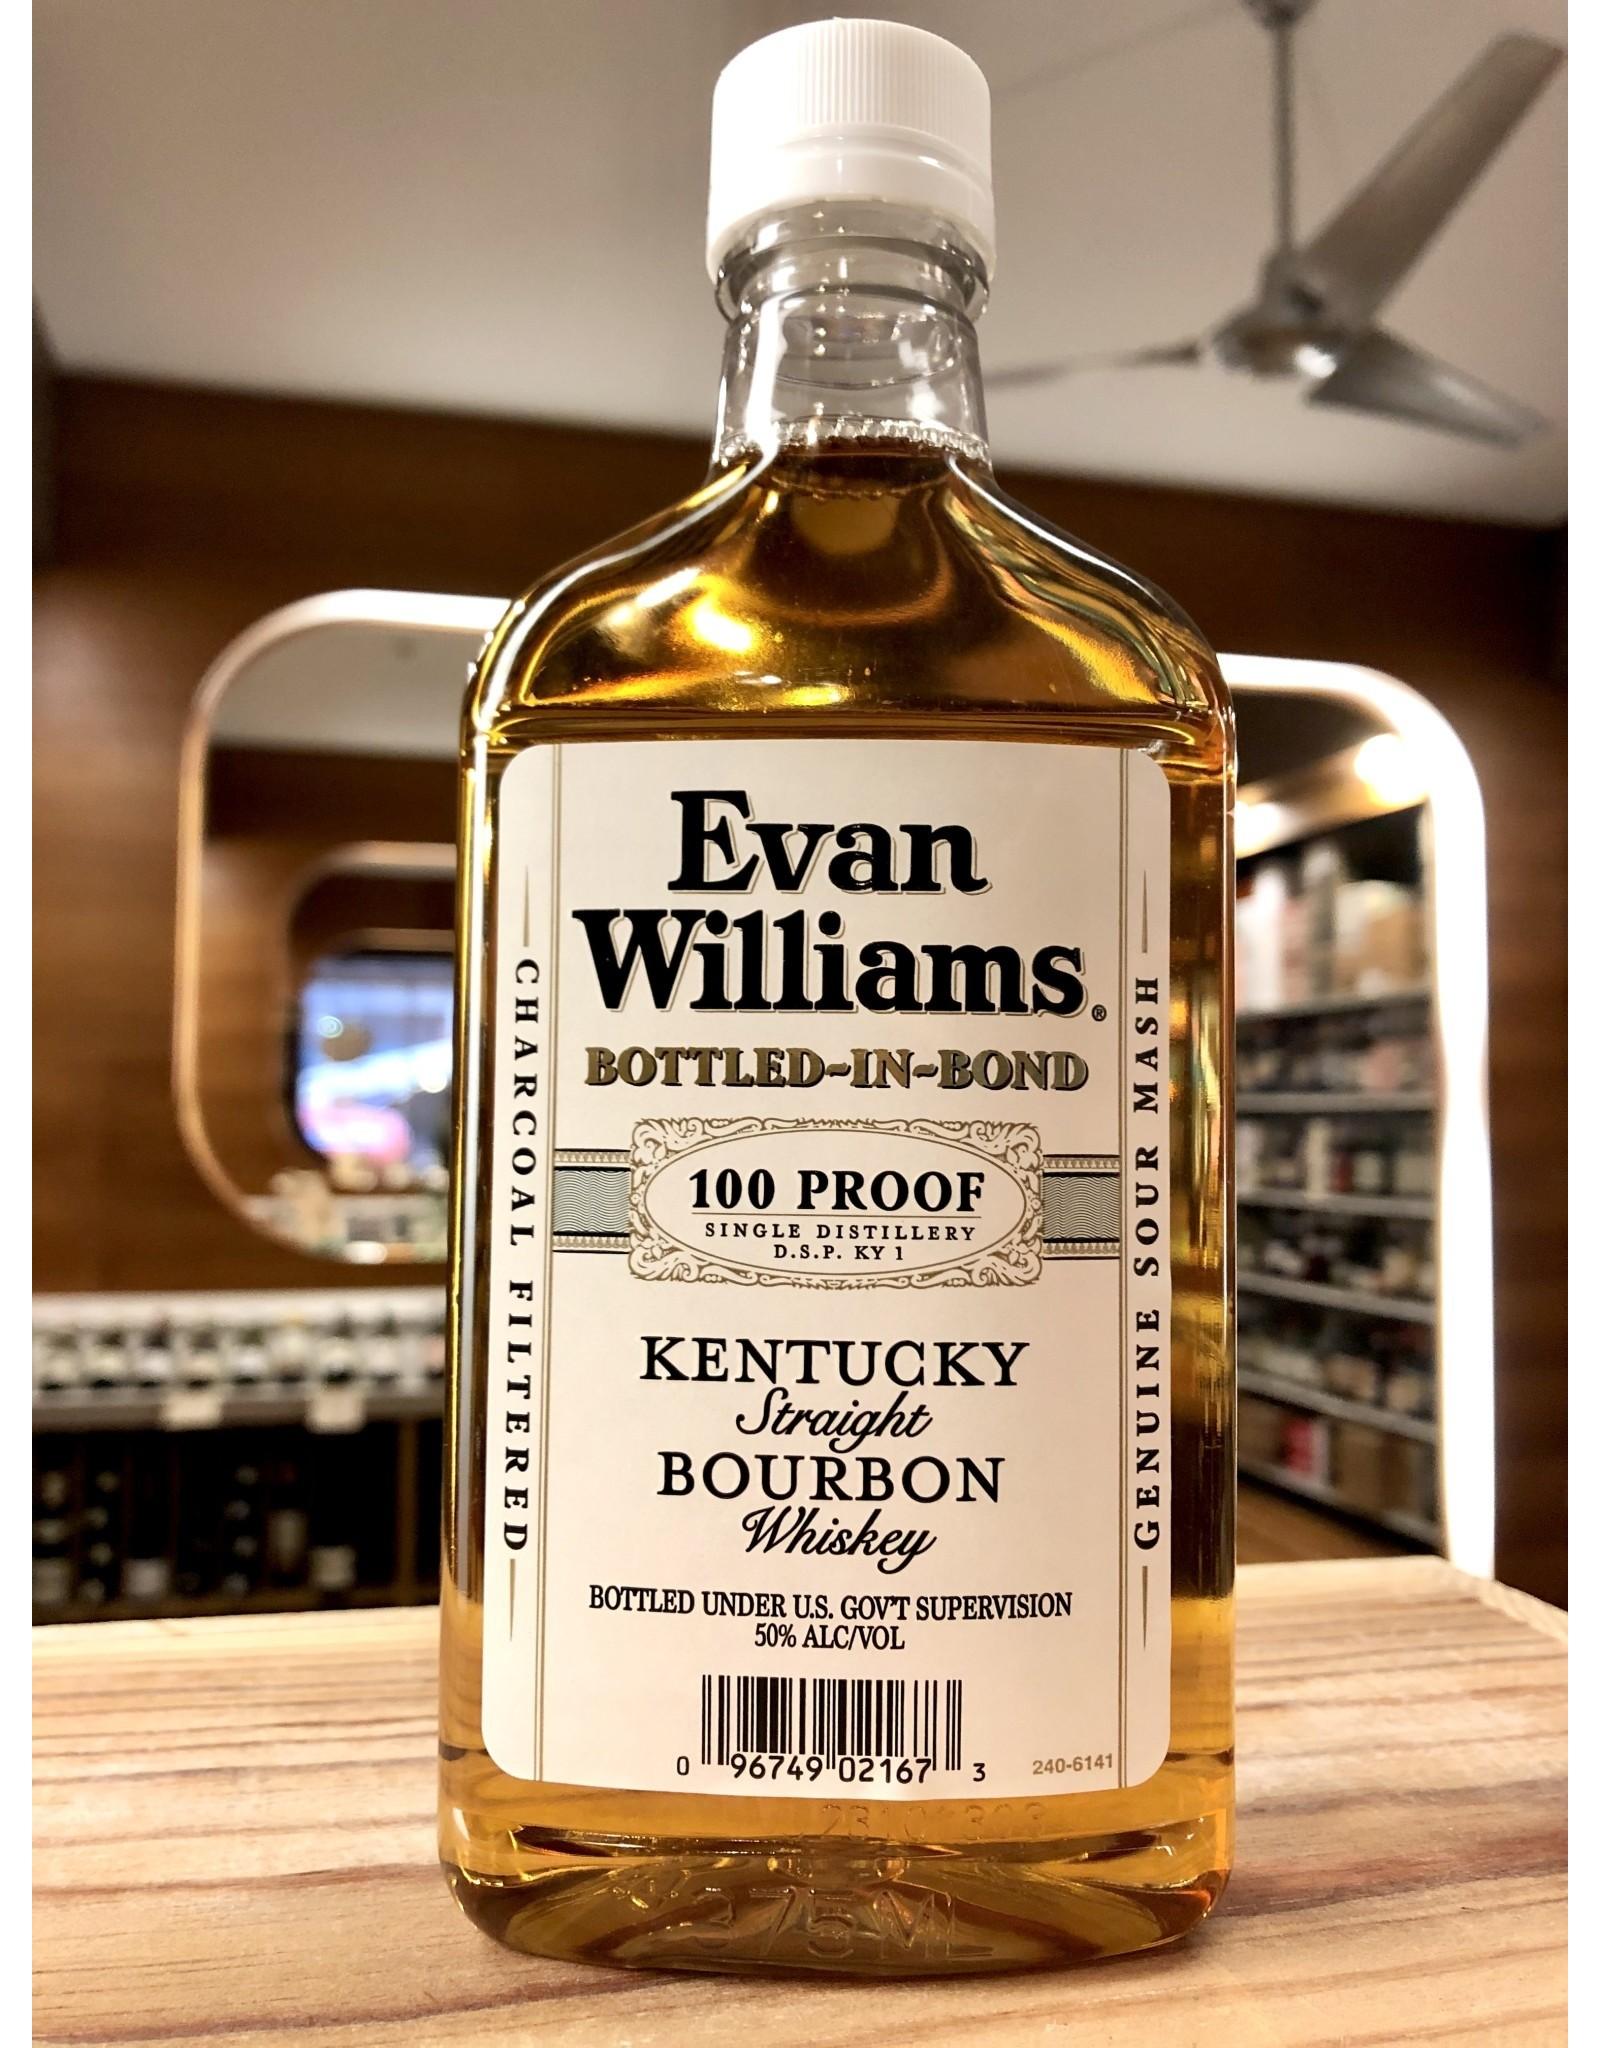 Evan Williams 100 Proof Bourbon - 375 ML